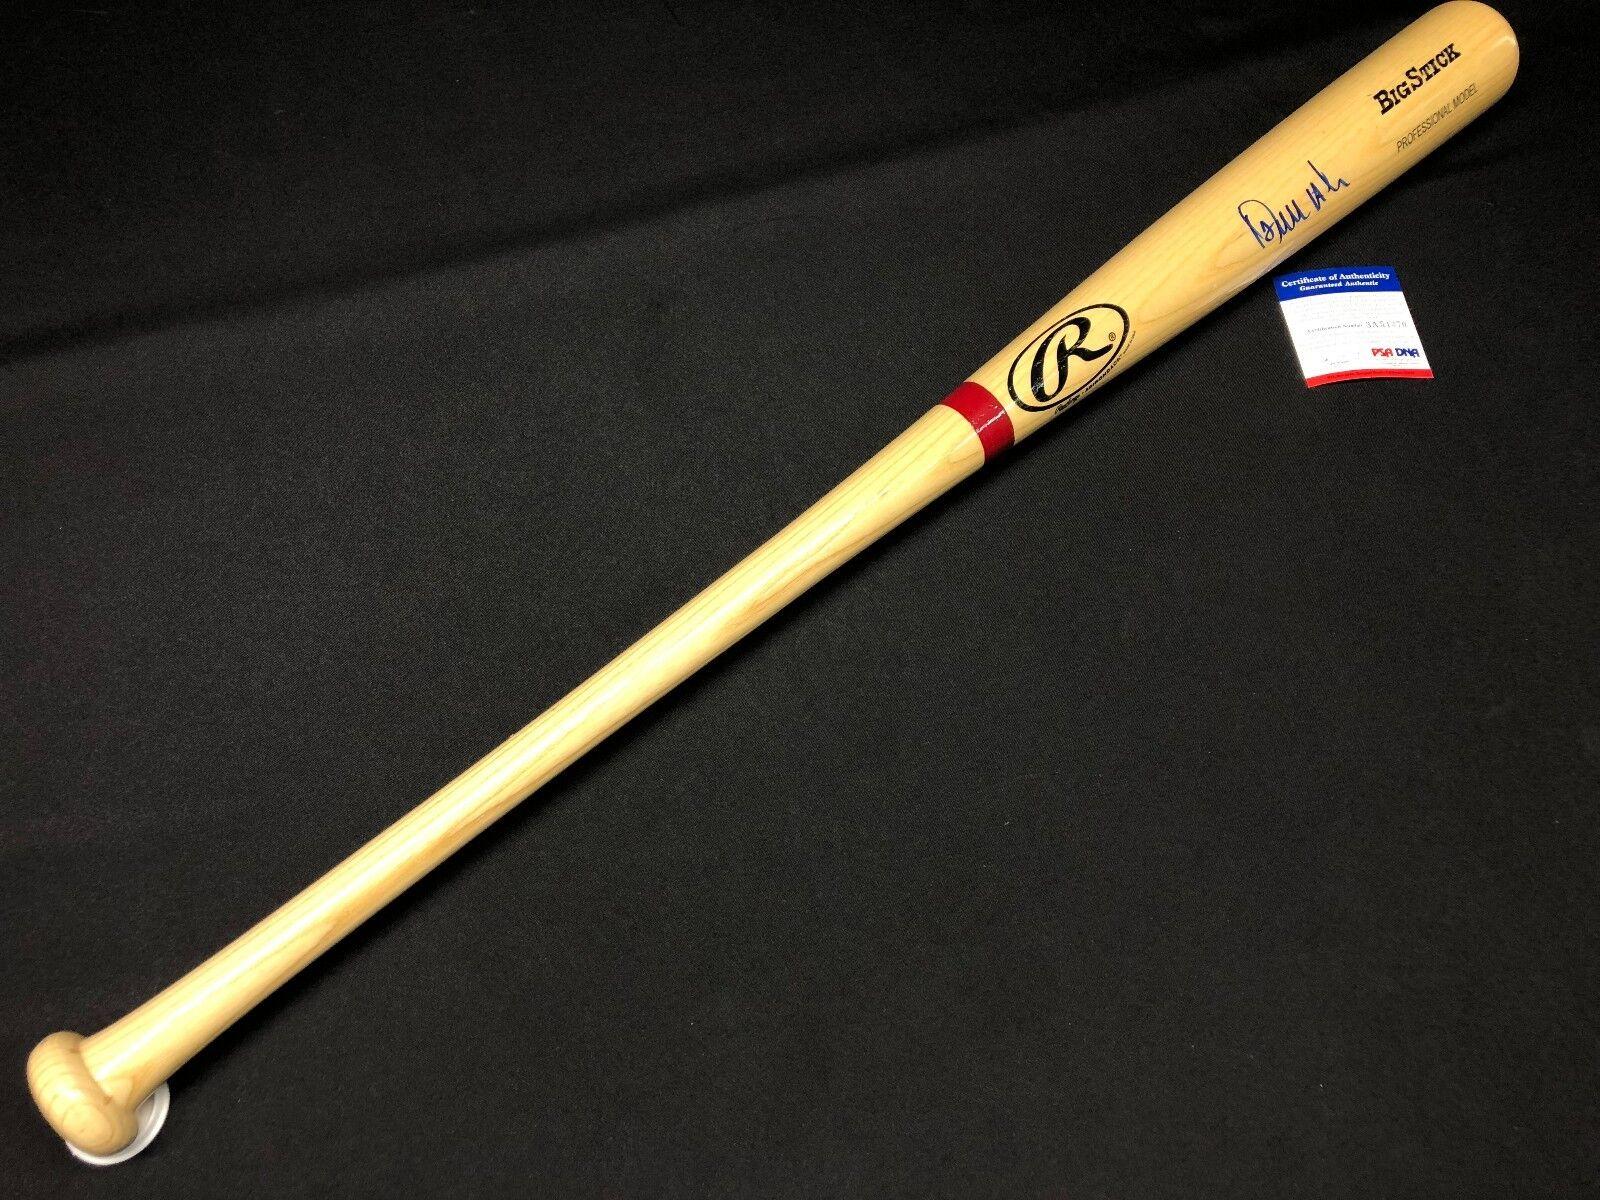 Erick Aybar Signed Ash Rawlings Big Stick Baseball Bat *Angels PSA 3A54370